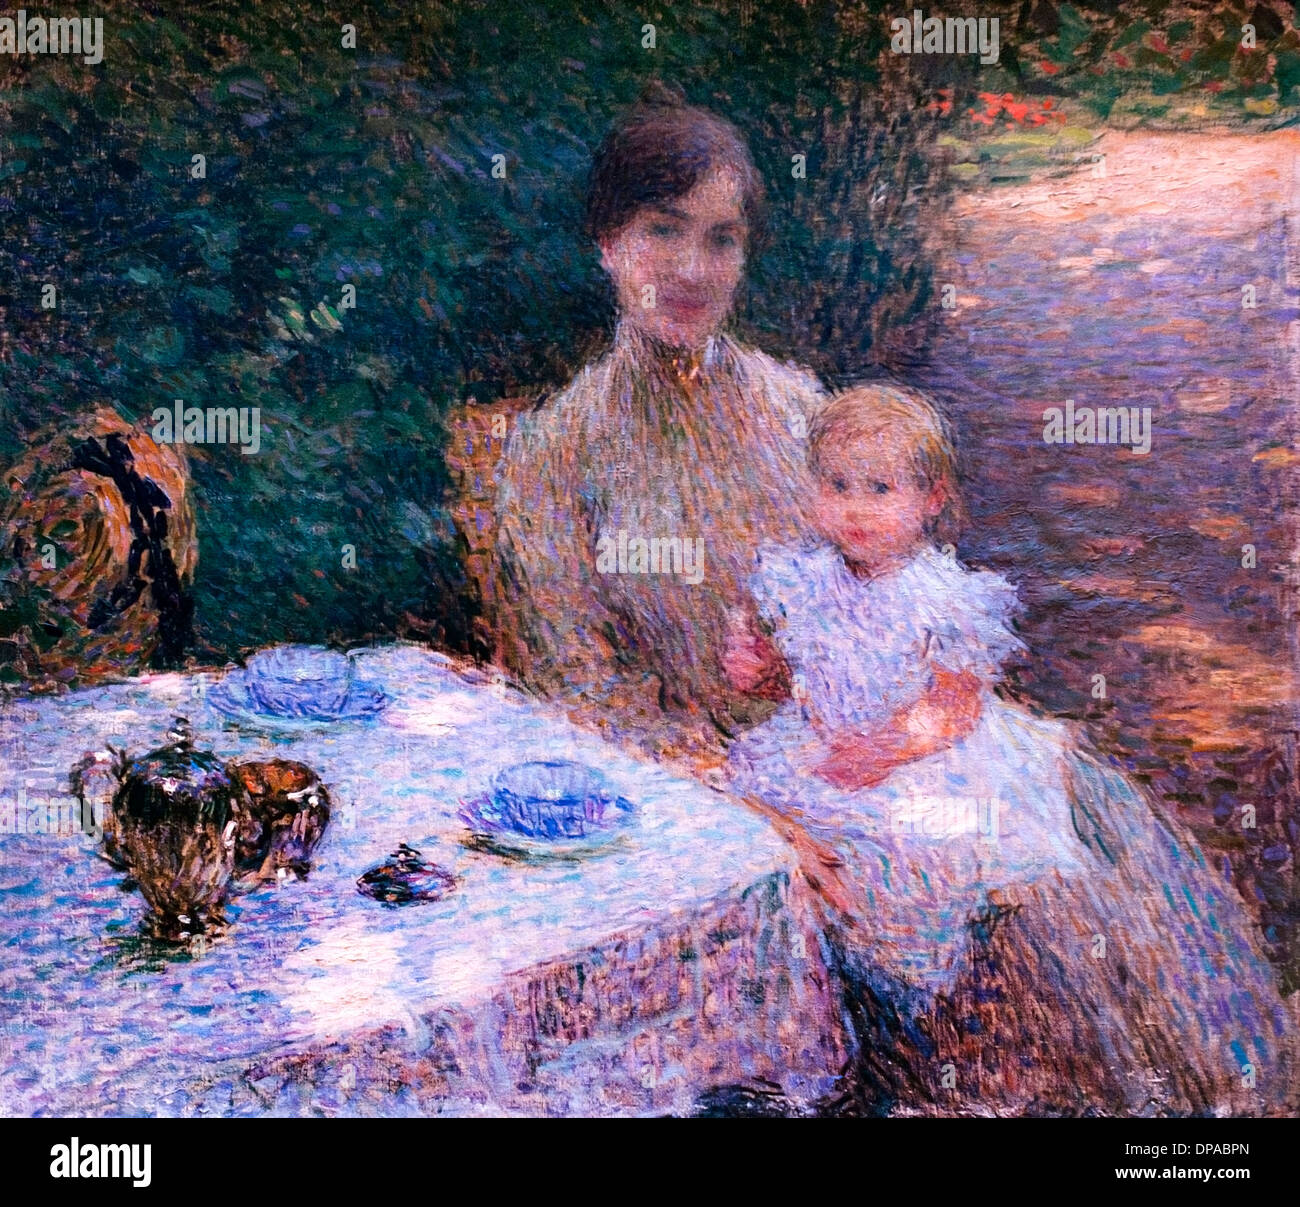 Le Gouter dans le jardin - Il gusto del giardino 1904 Ernest Joseph Laurent 1859 - 1929 Francia - Francese Immagini Stock